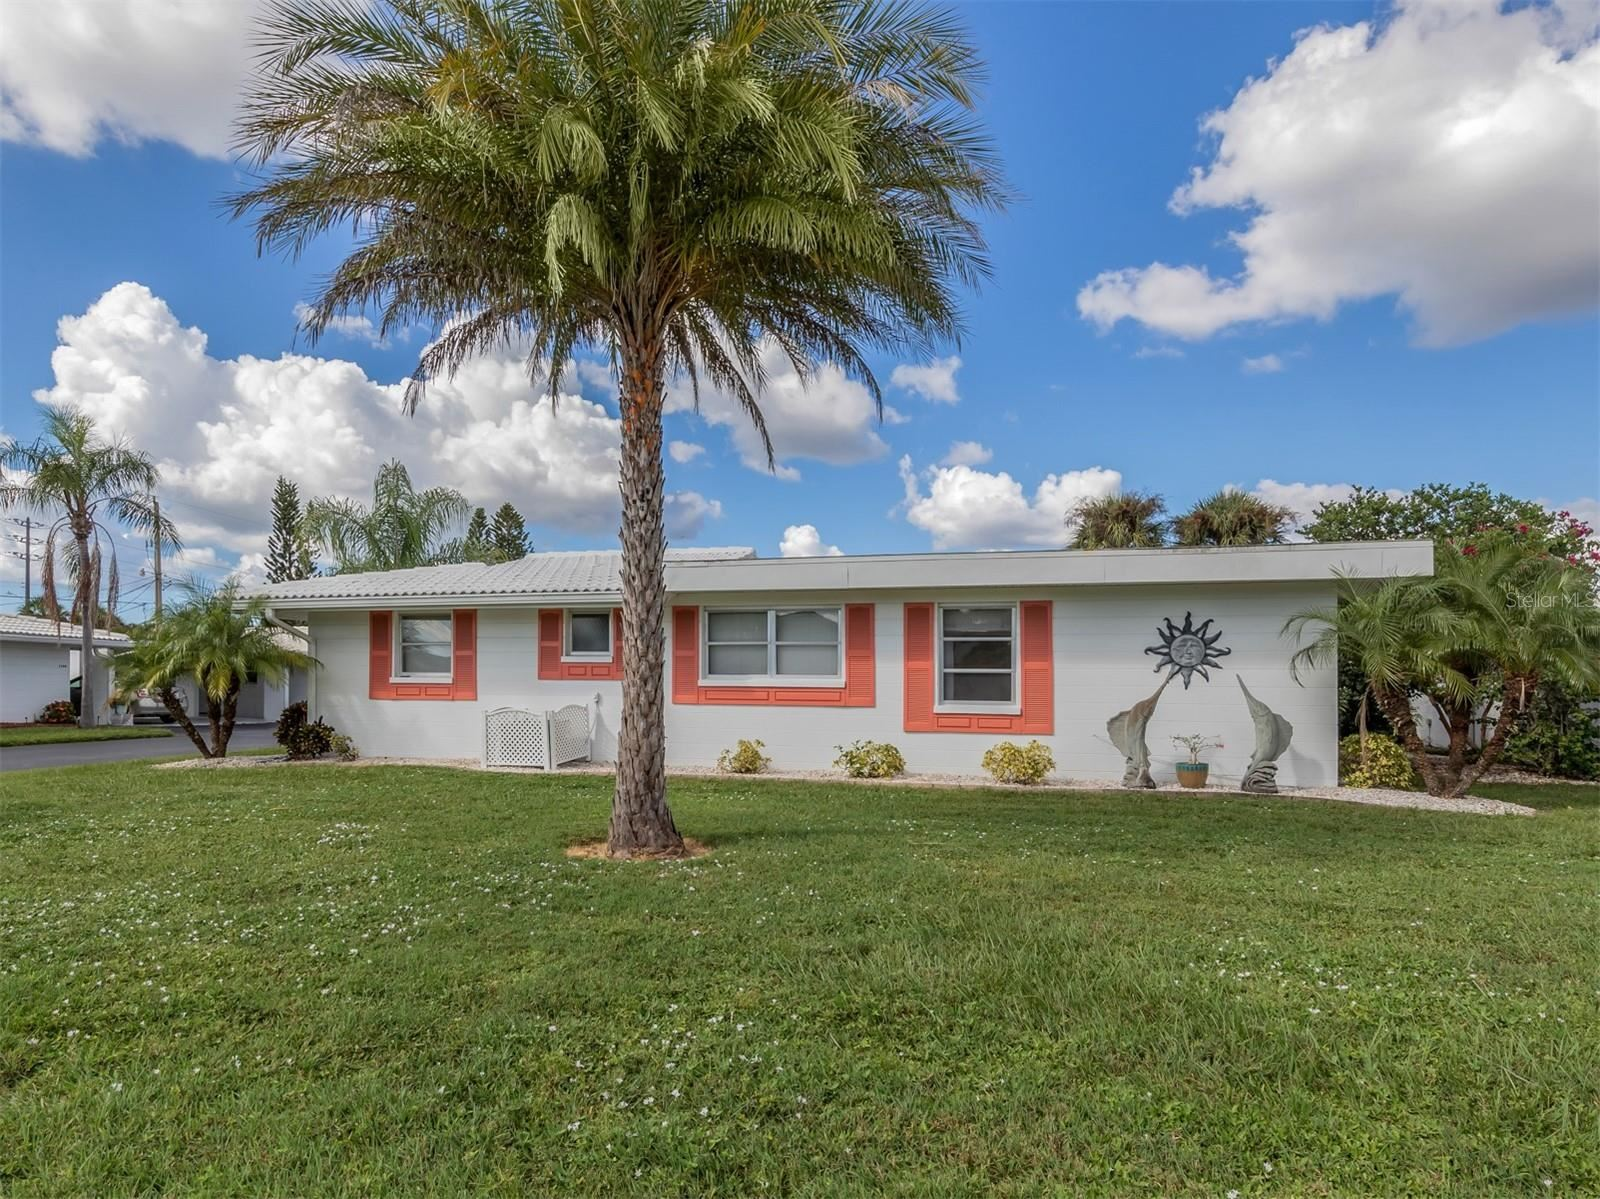 Photo of 1743 CARIBBEAN CIRCLE #14, VENICE, FL 34293 (MLS # N6117948)